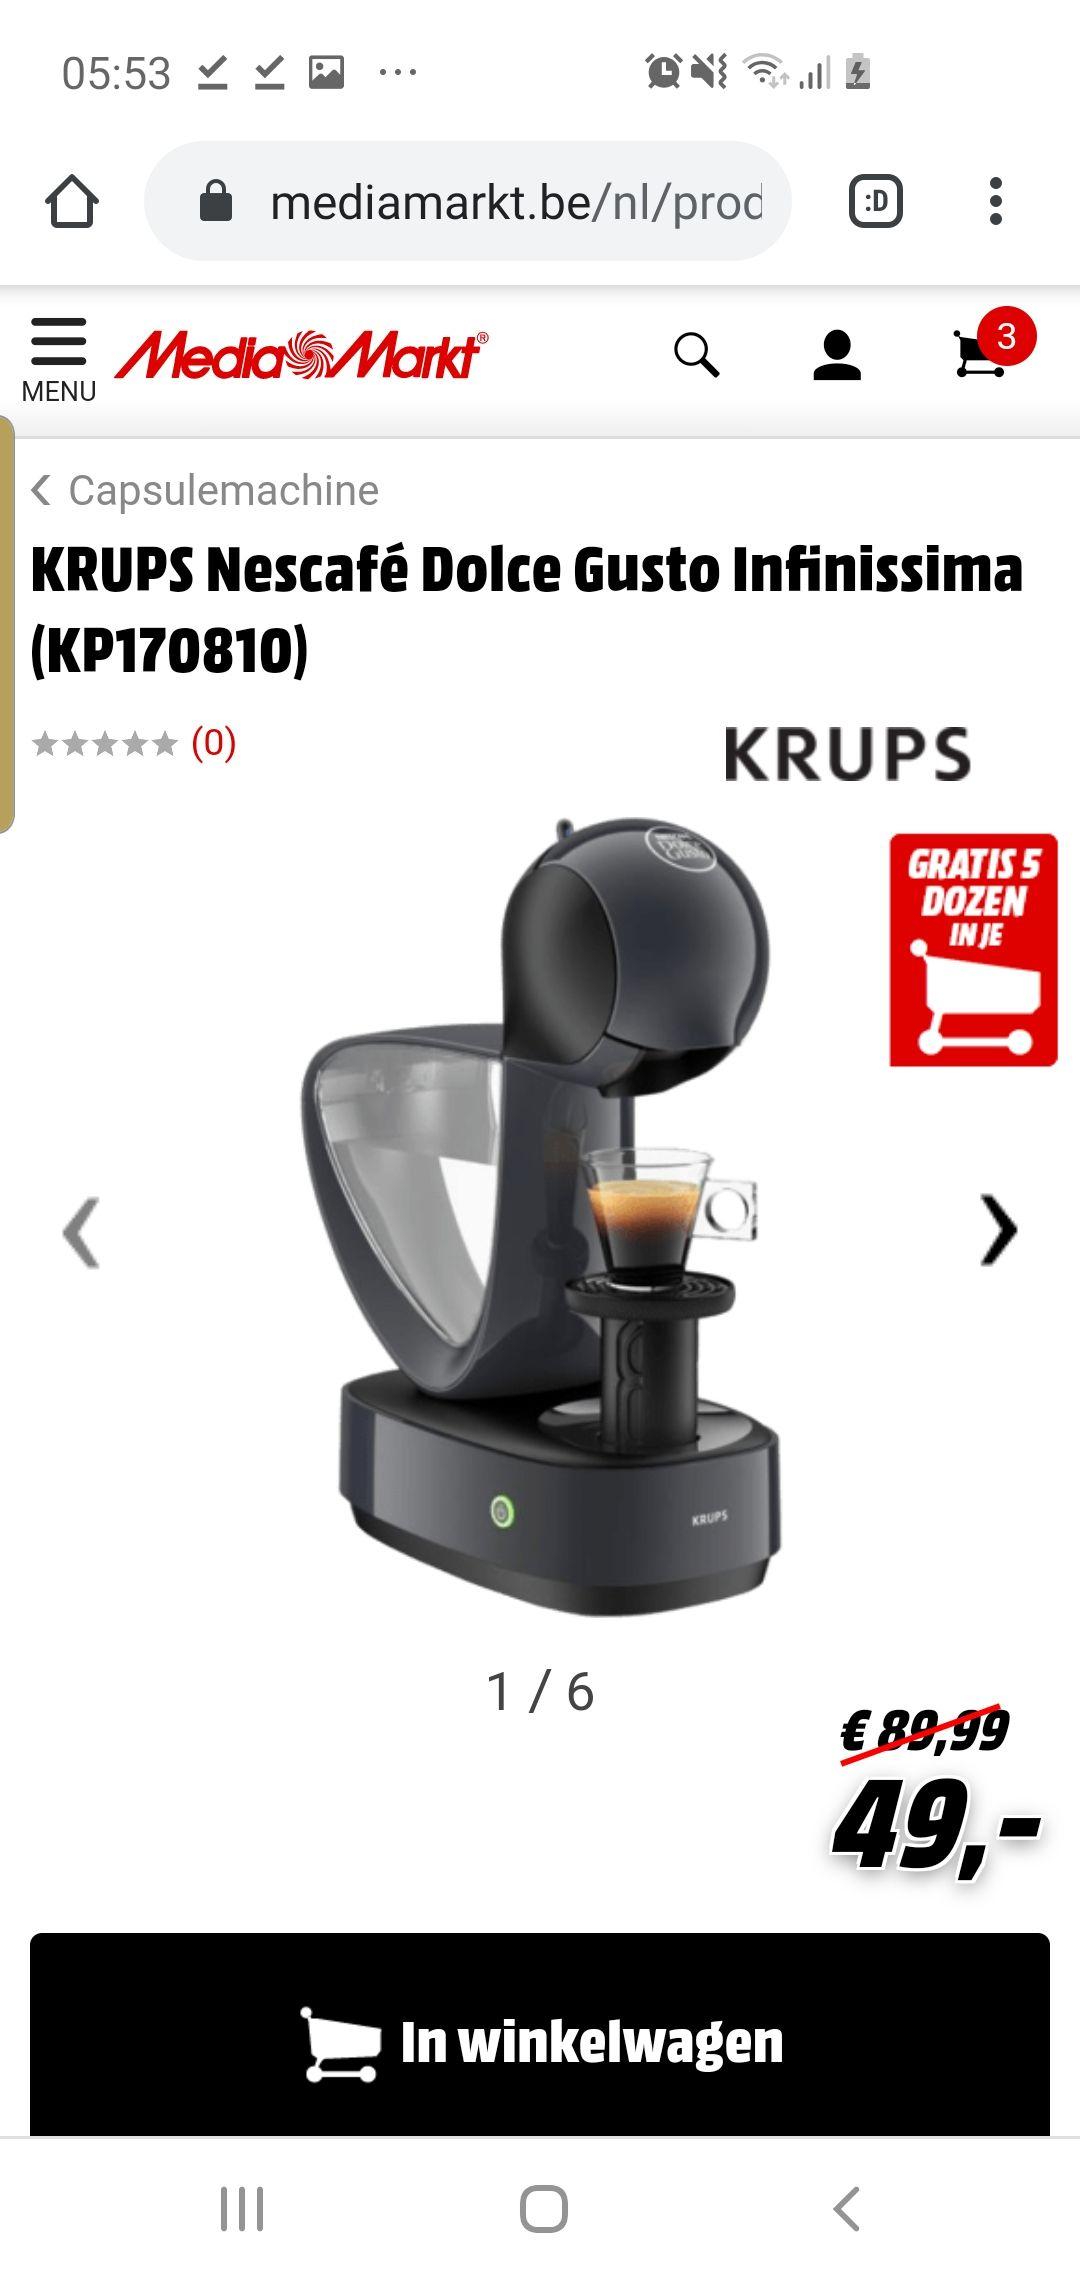 KRUPS Nescafé Dolce Gusto Infinissima (KP170810) met 80 gratis capsules